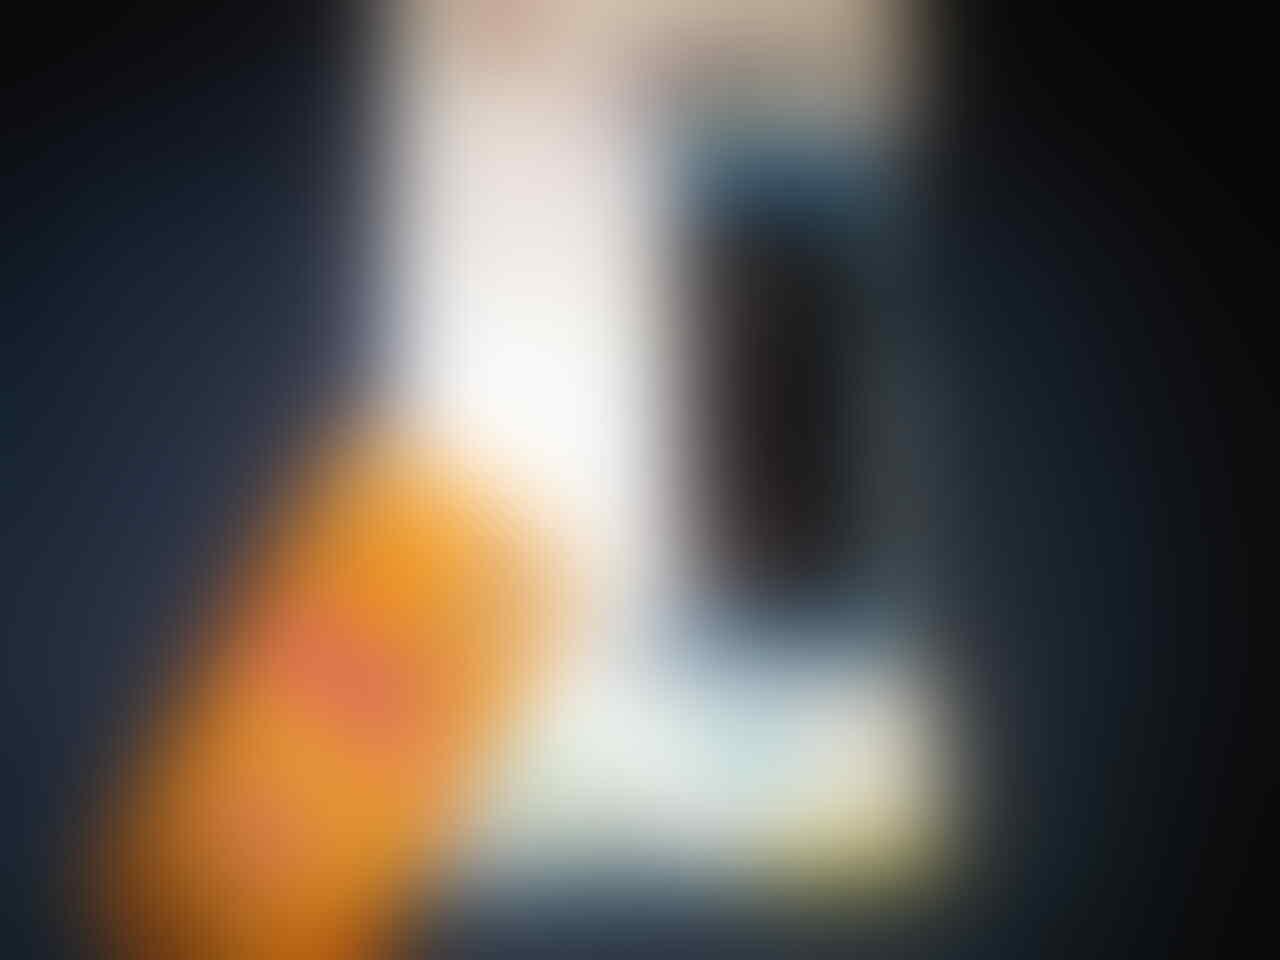 ORIGINAL VIVAN Charger mobil Watson,PortableCharger Powerbank 3000, 5600, 8400 murah!